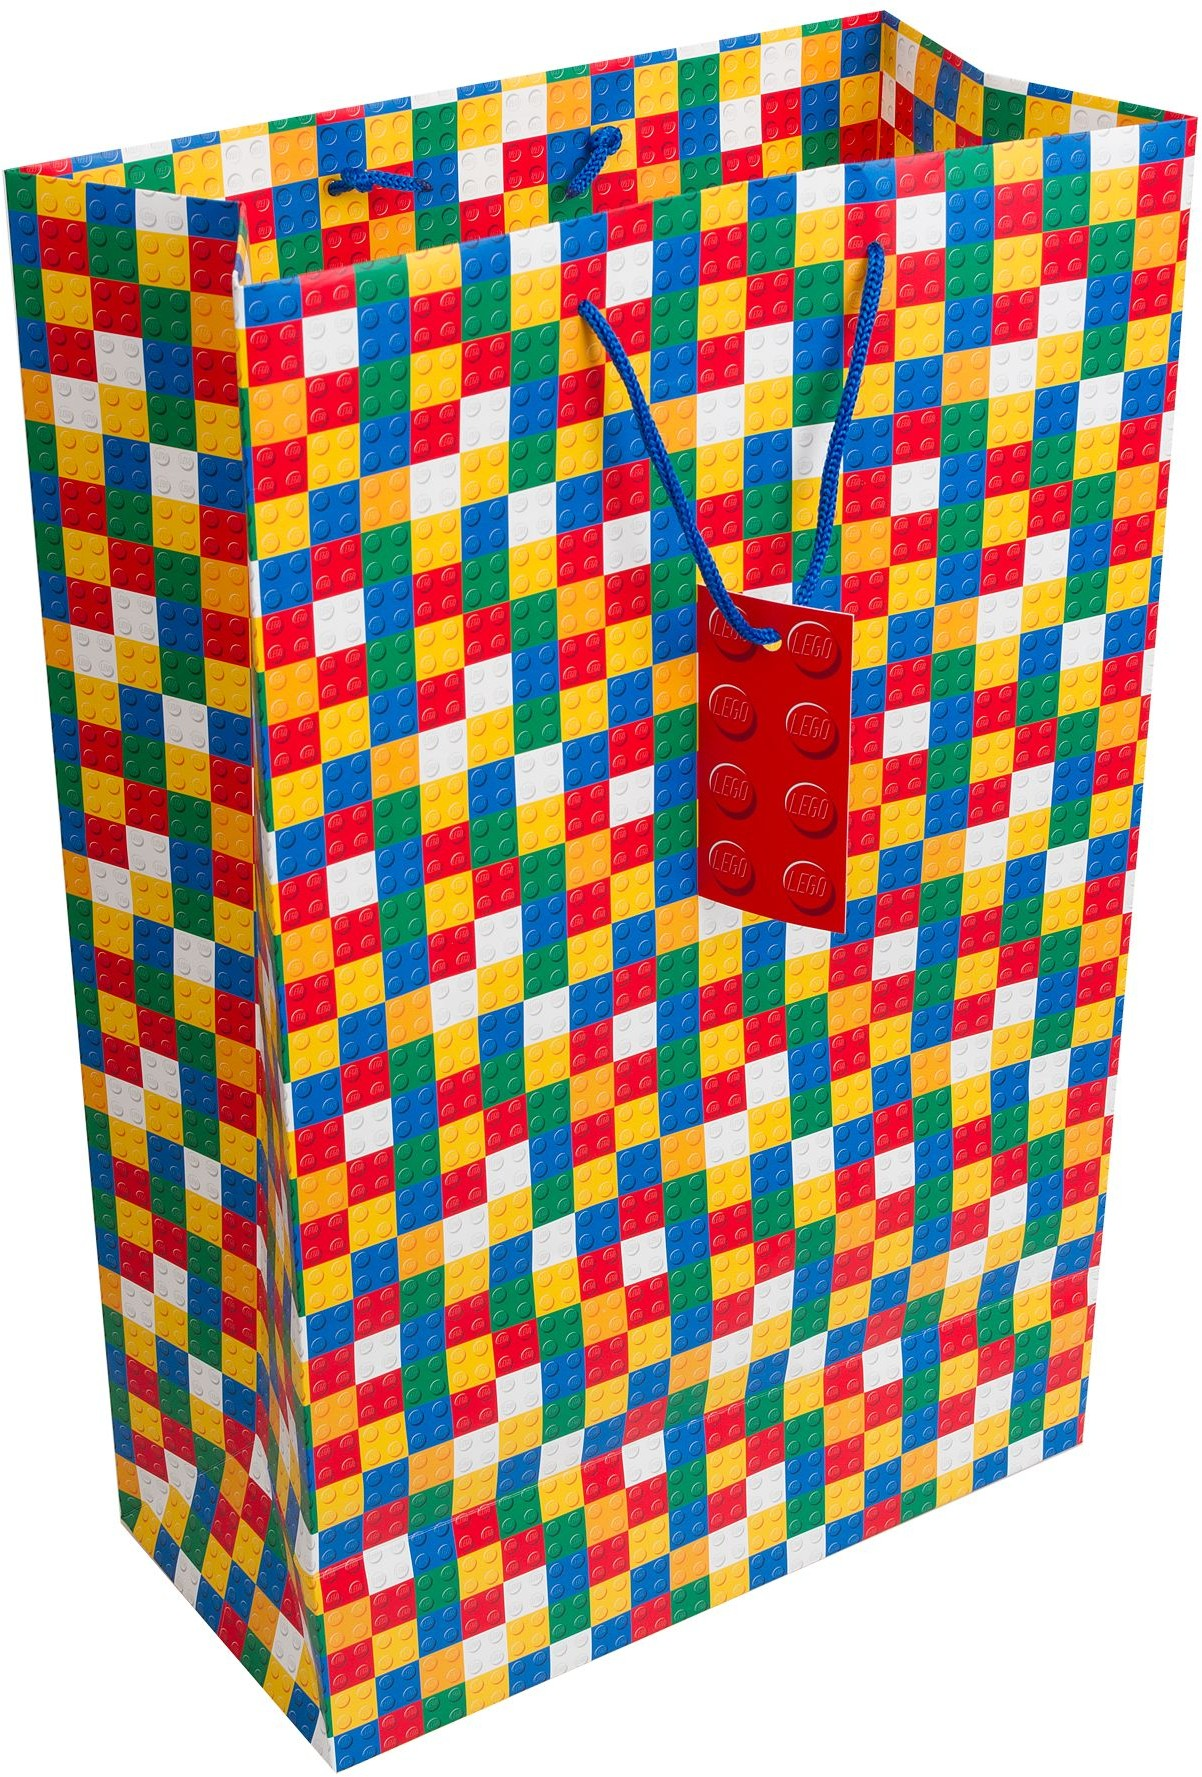 850840 Classic Gift Bag   Brickipedia   FANDOM powered by Wikia